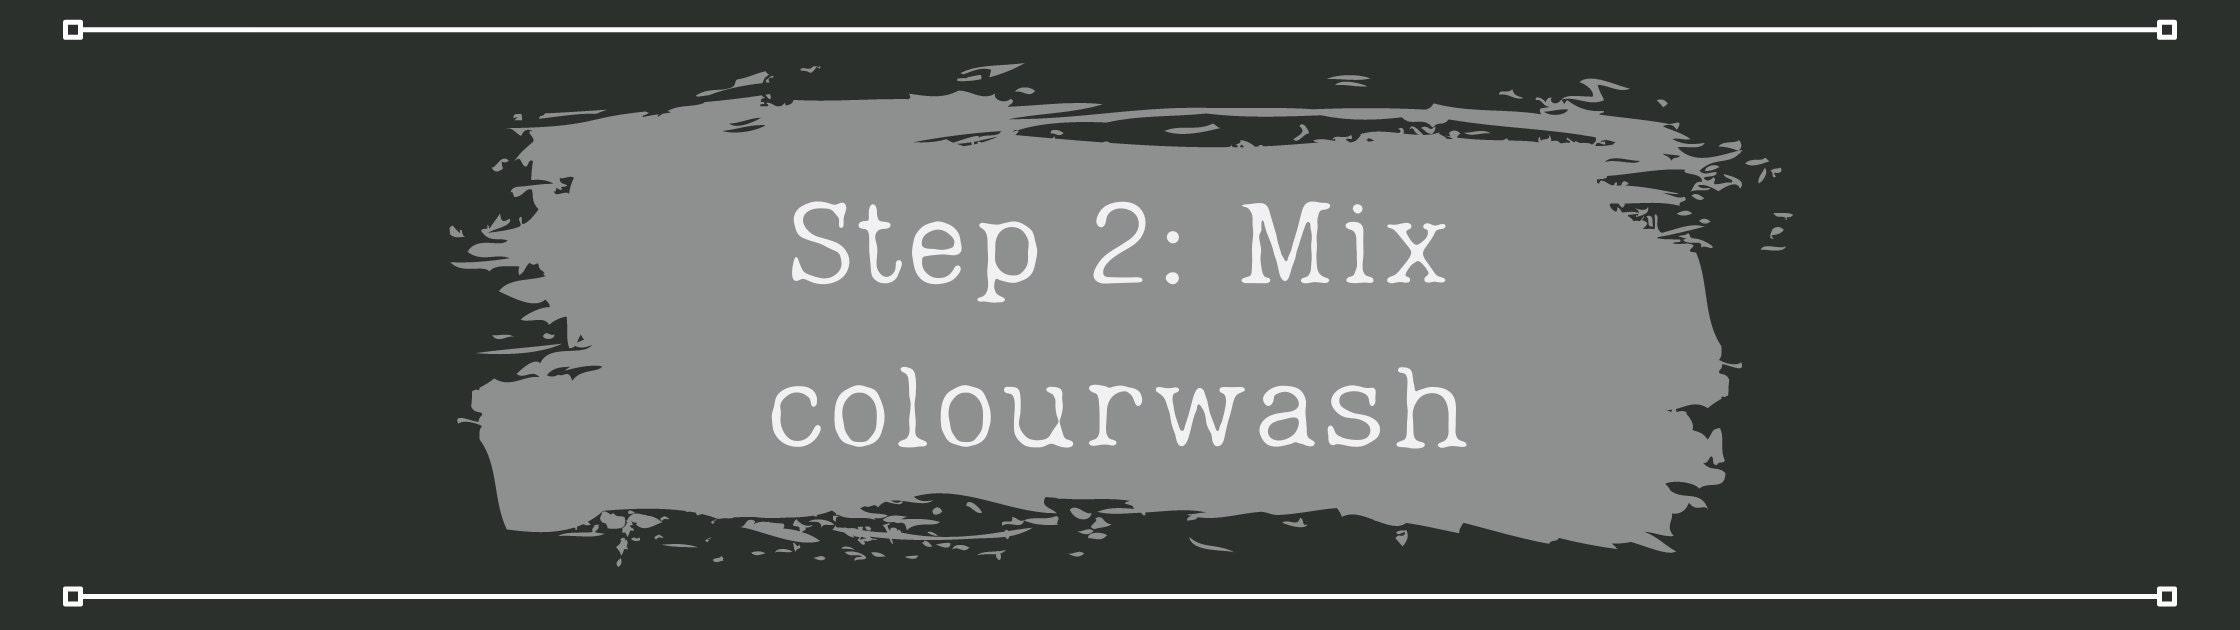 Mixing a colourwash